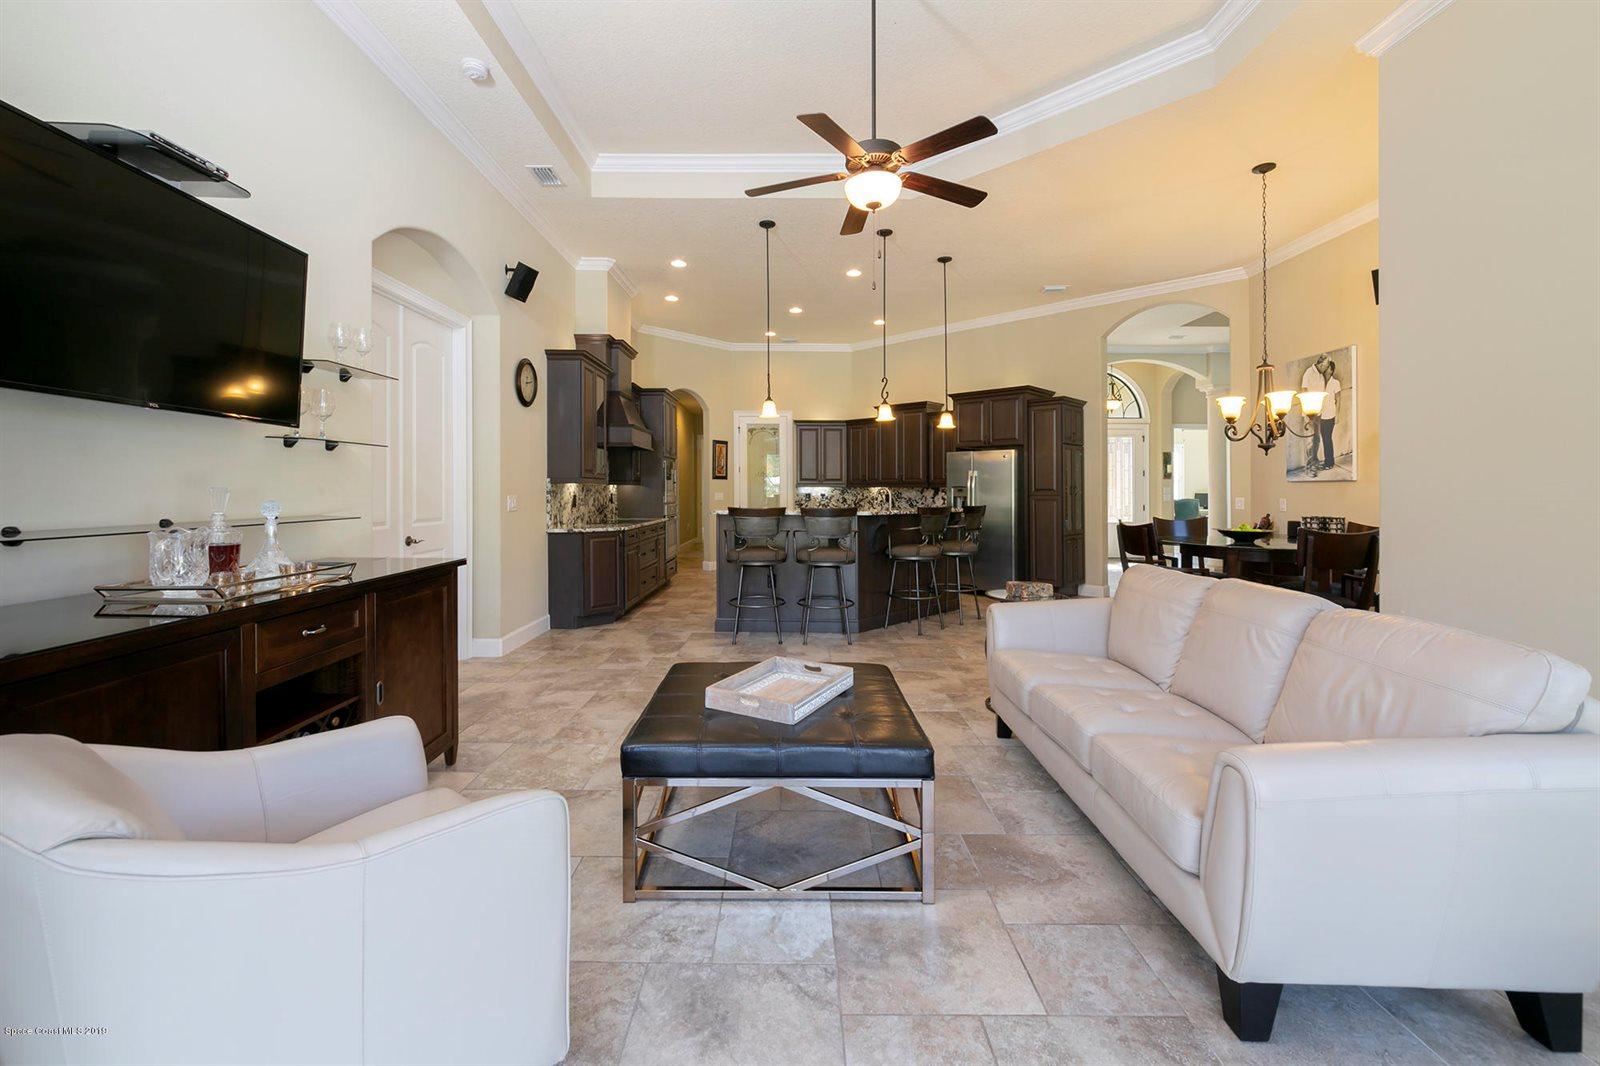 170 Smith Road, Merritt Island, FL 32953